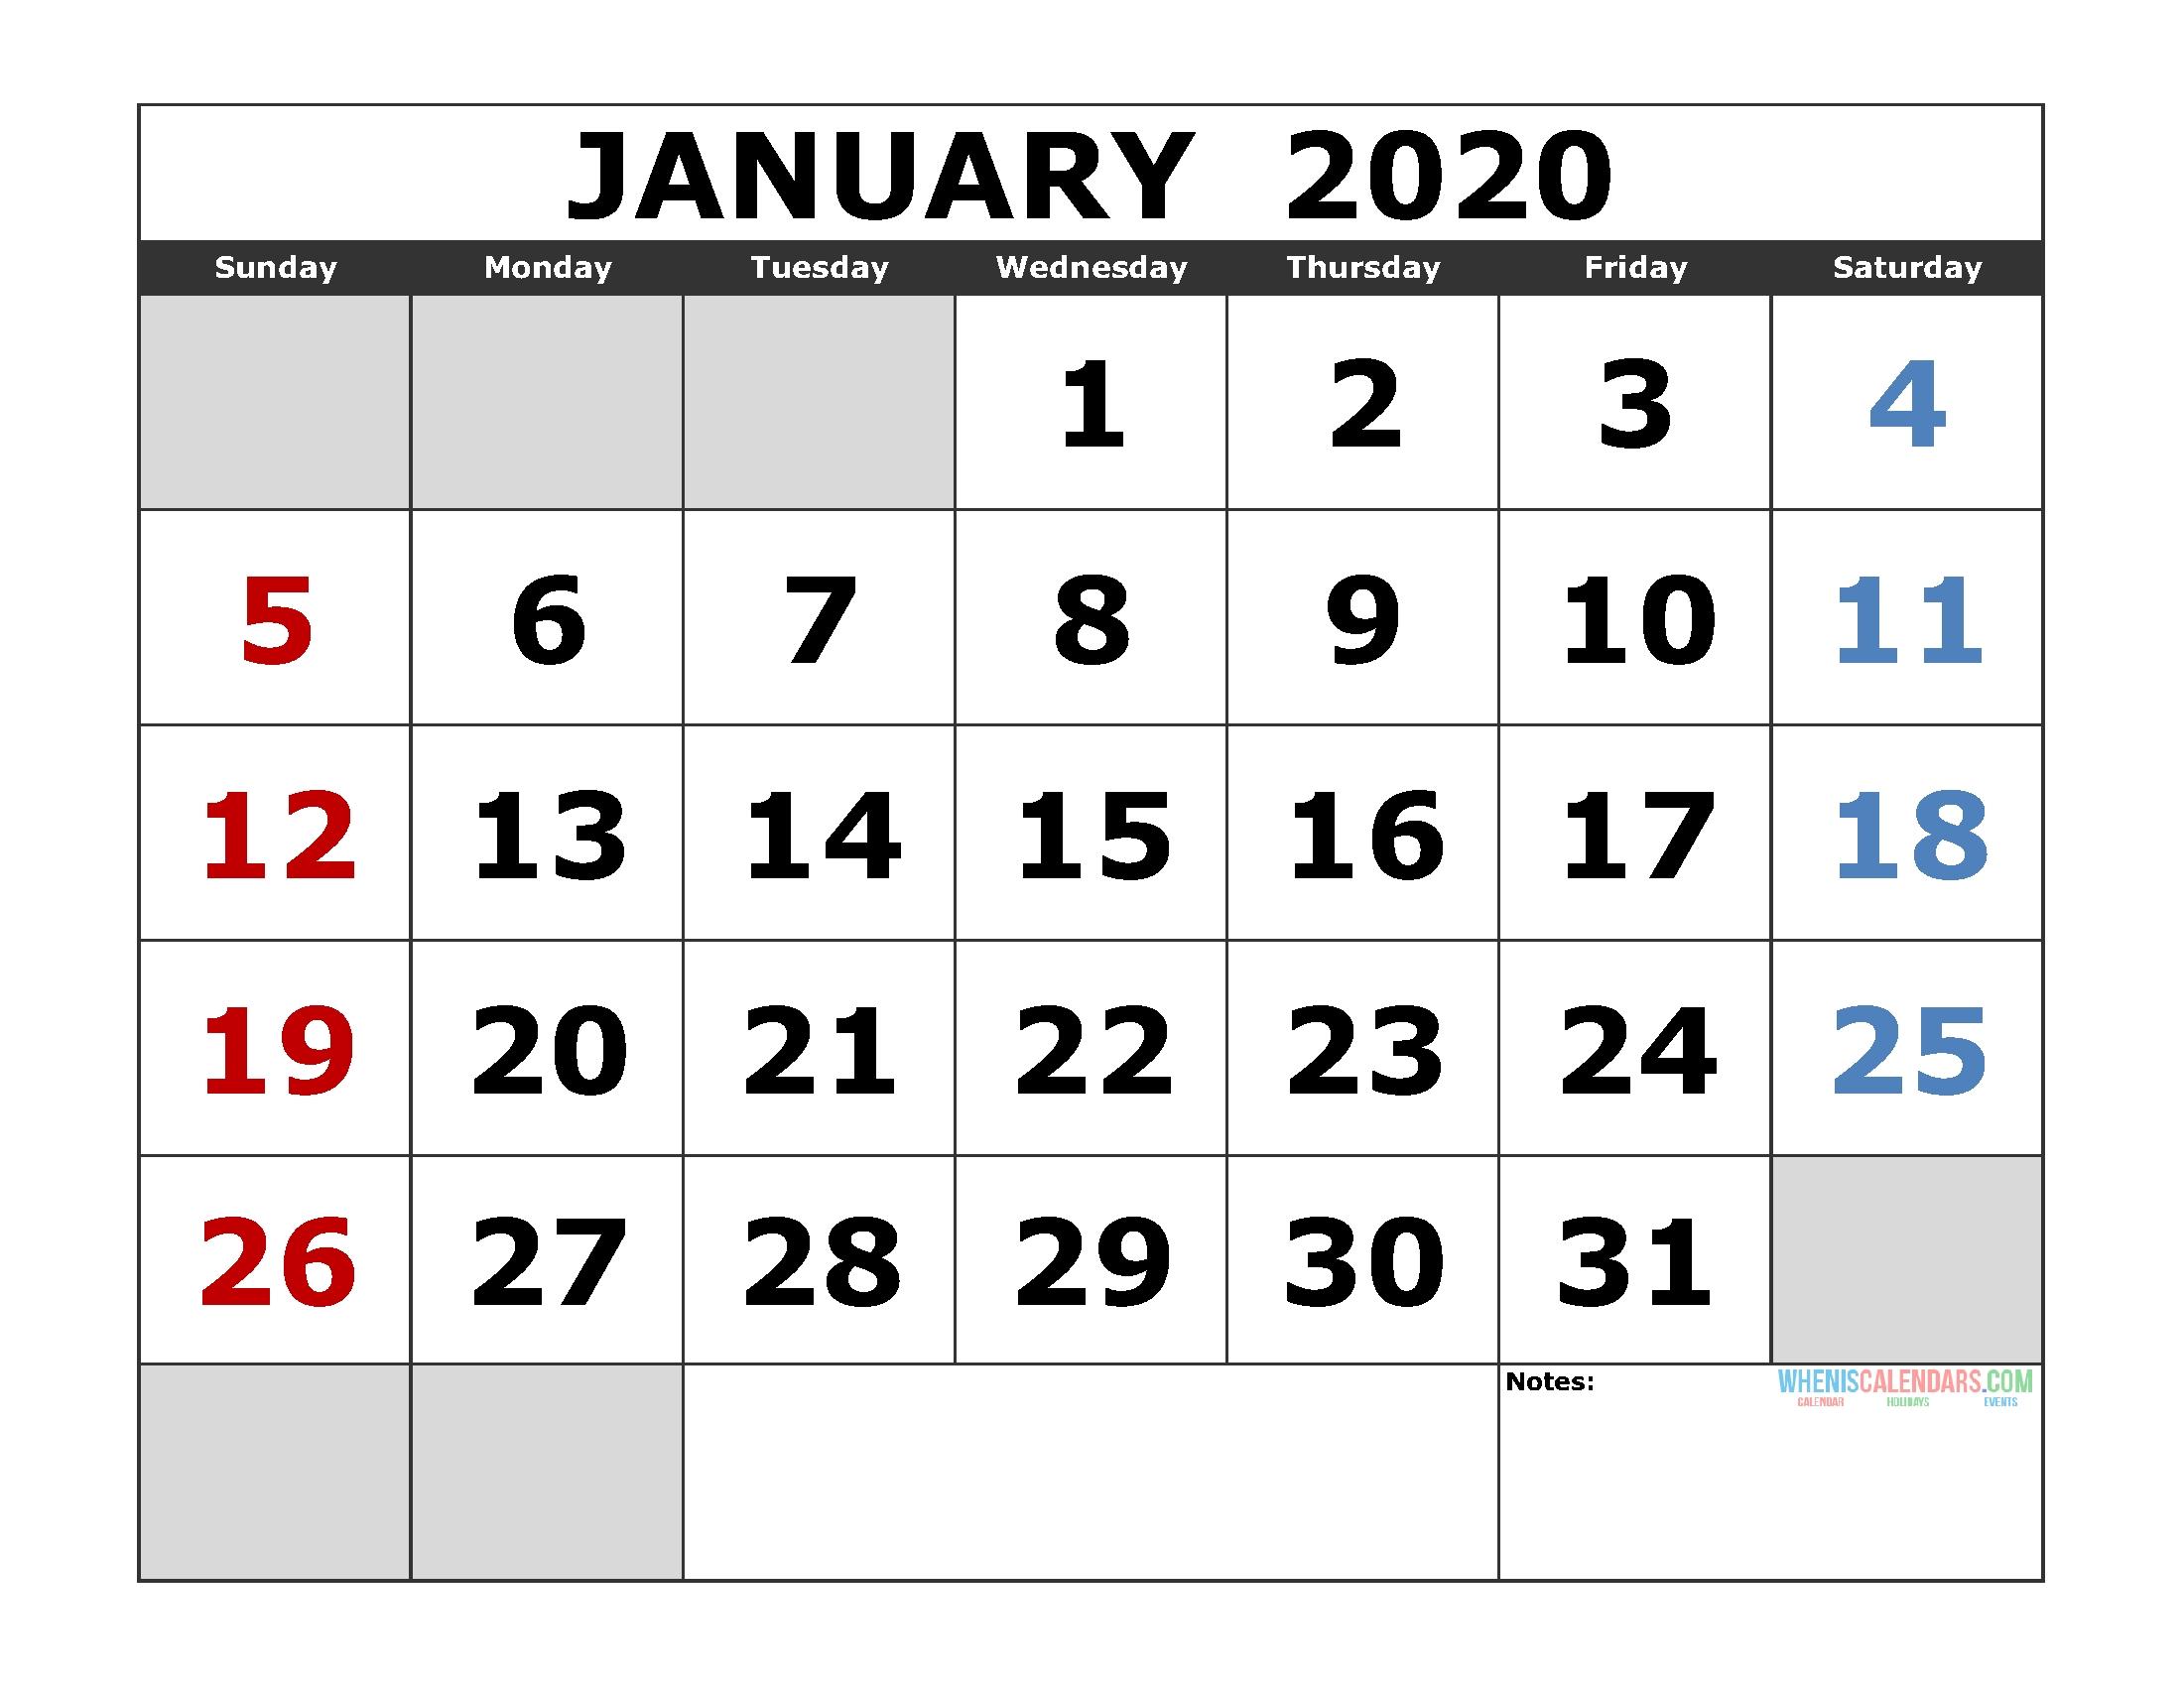 January 2020 Printable Calendar Template Excel, Pdf, Image-Jewish Calendar January 2020